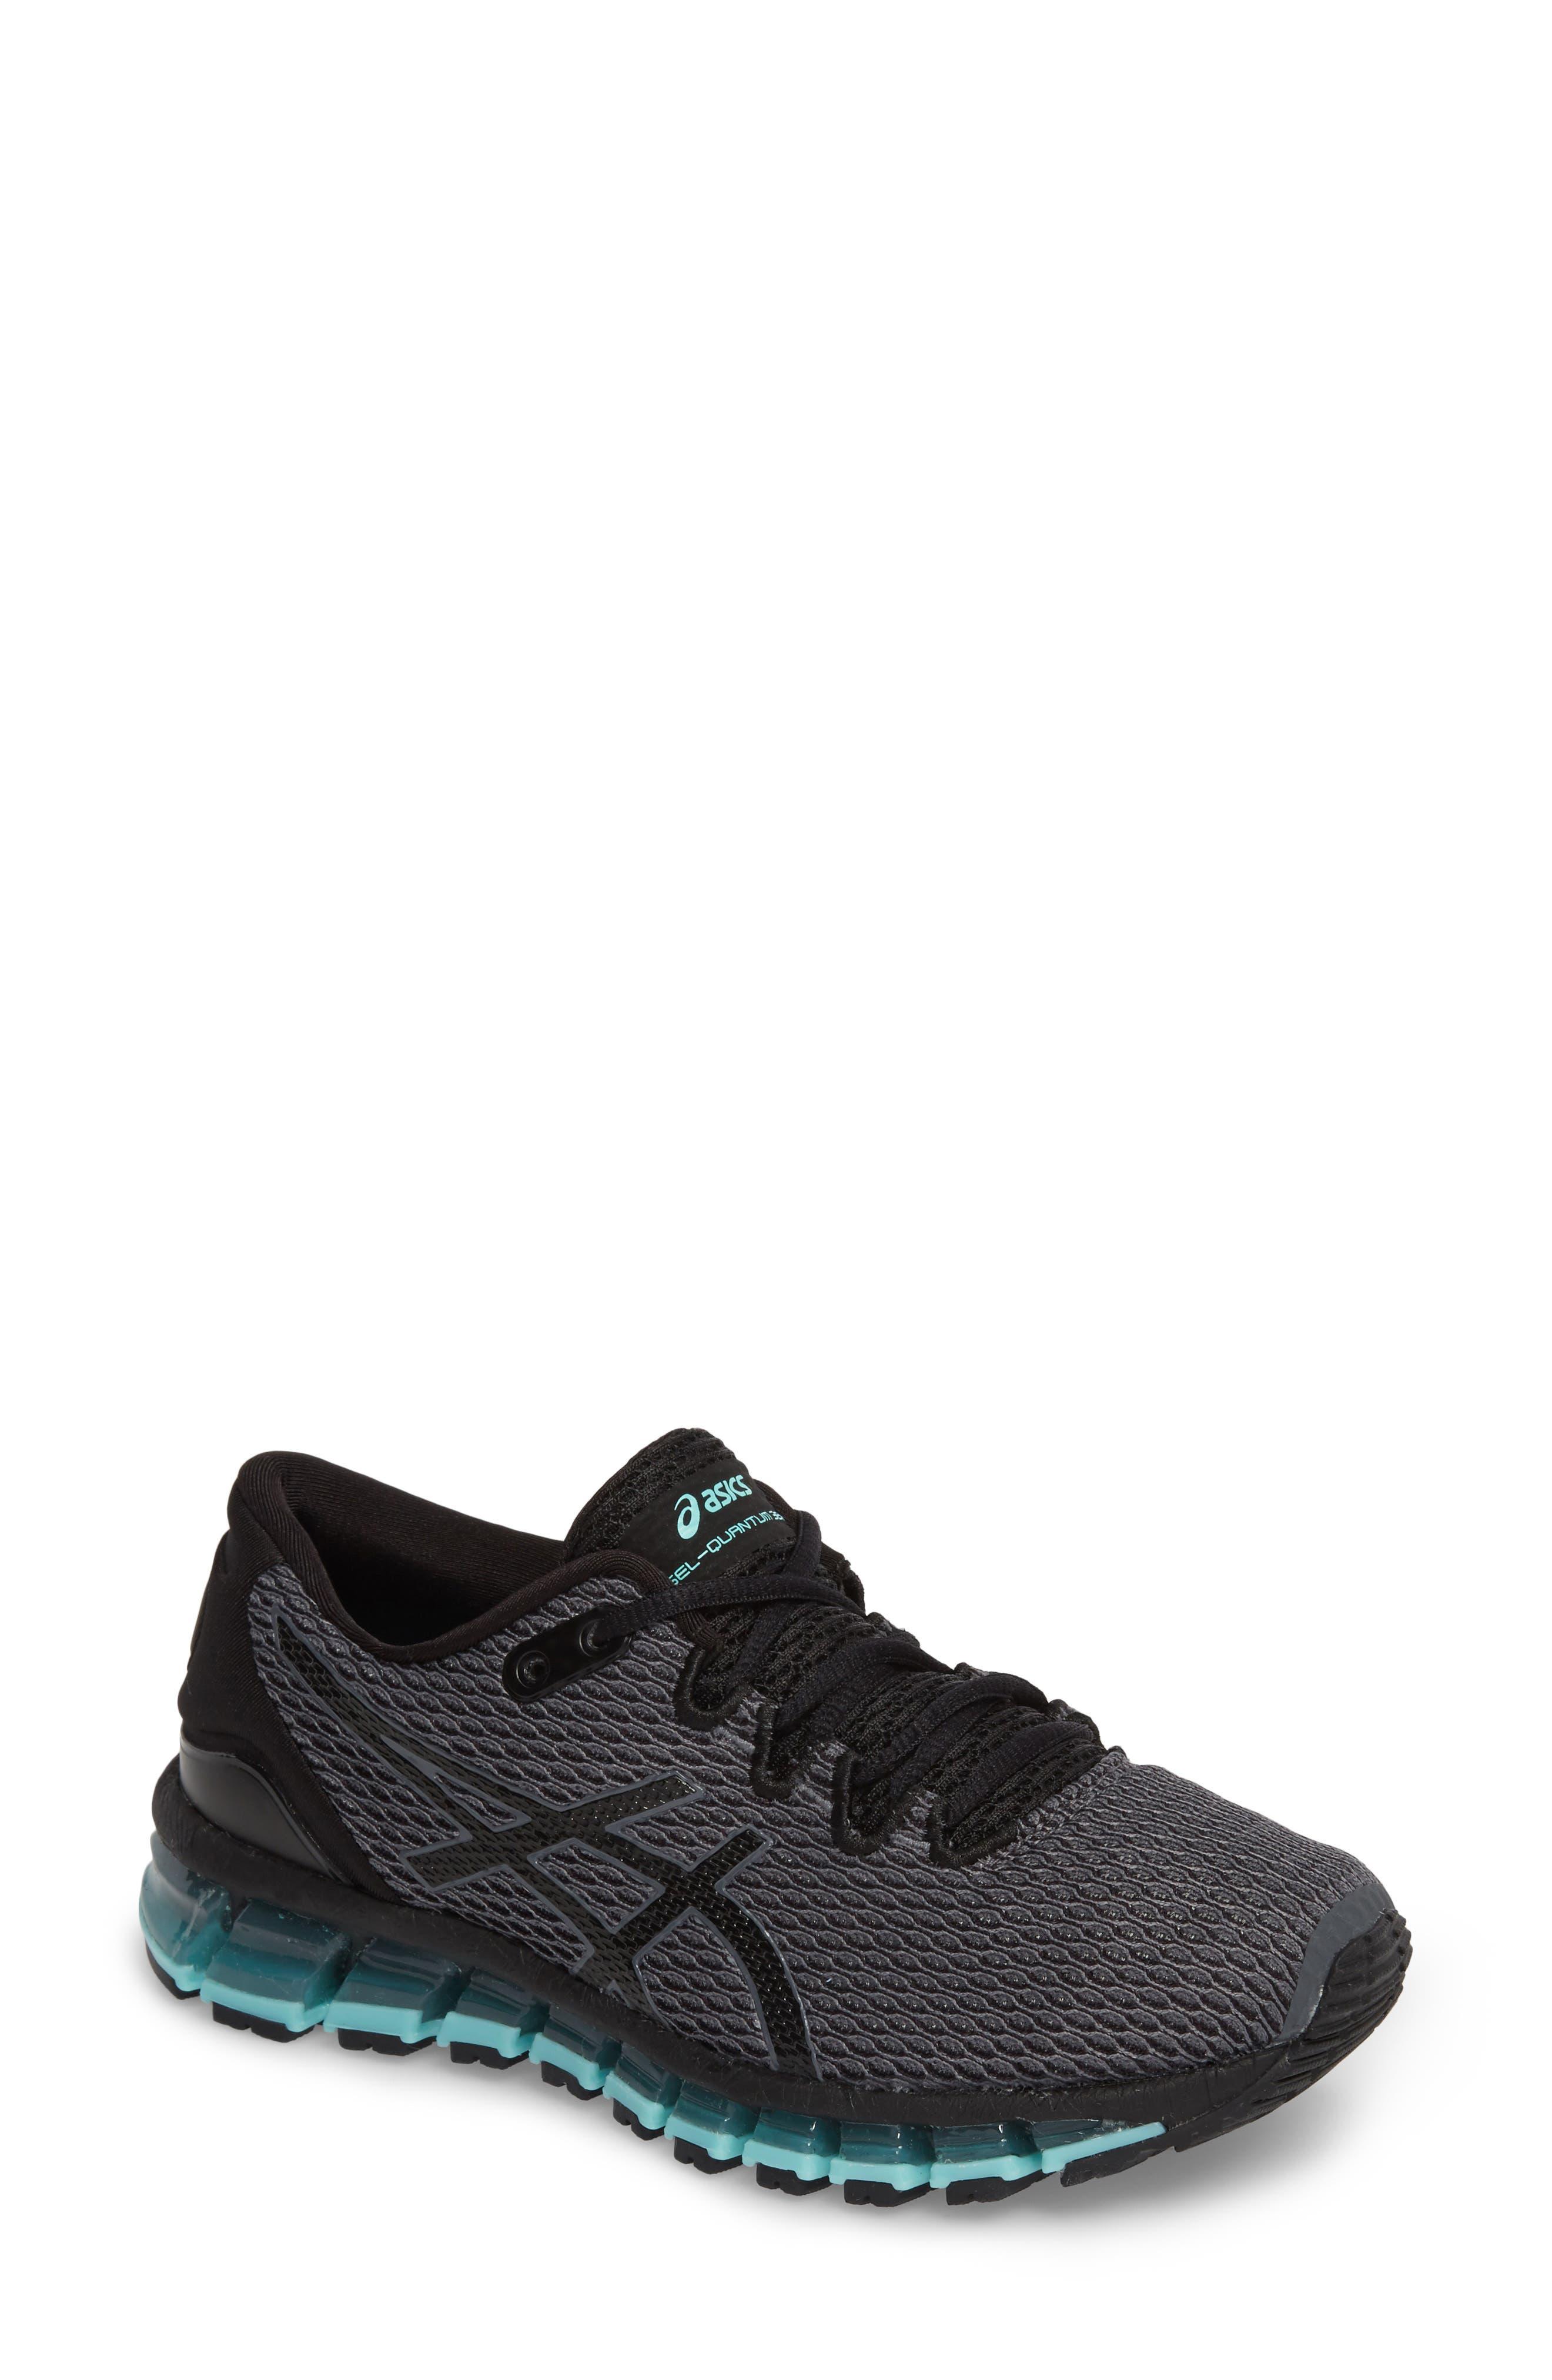 GEL-Quantum 360 Shift MX Running Shoe,                         Main,                         color, CARBON/ BLACK/ ARUBA BLUE